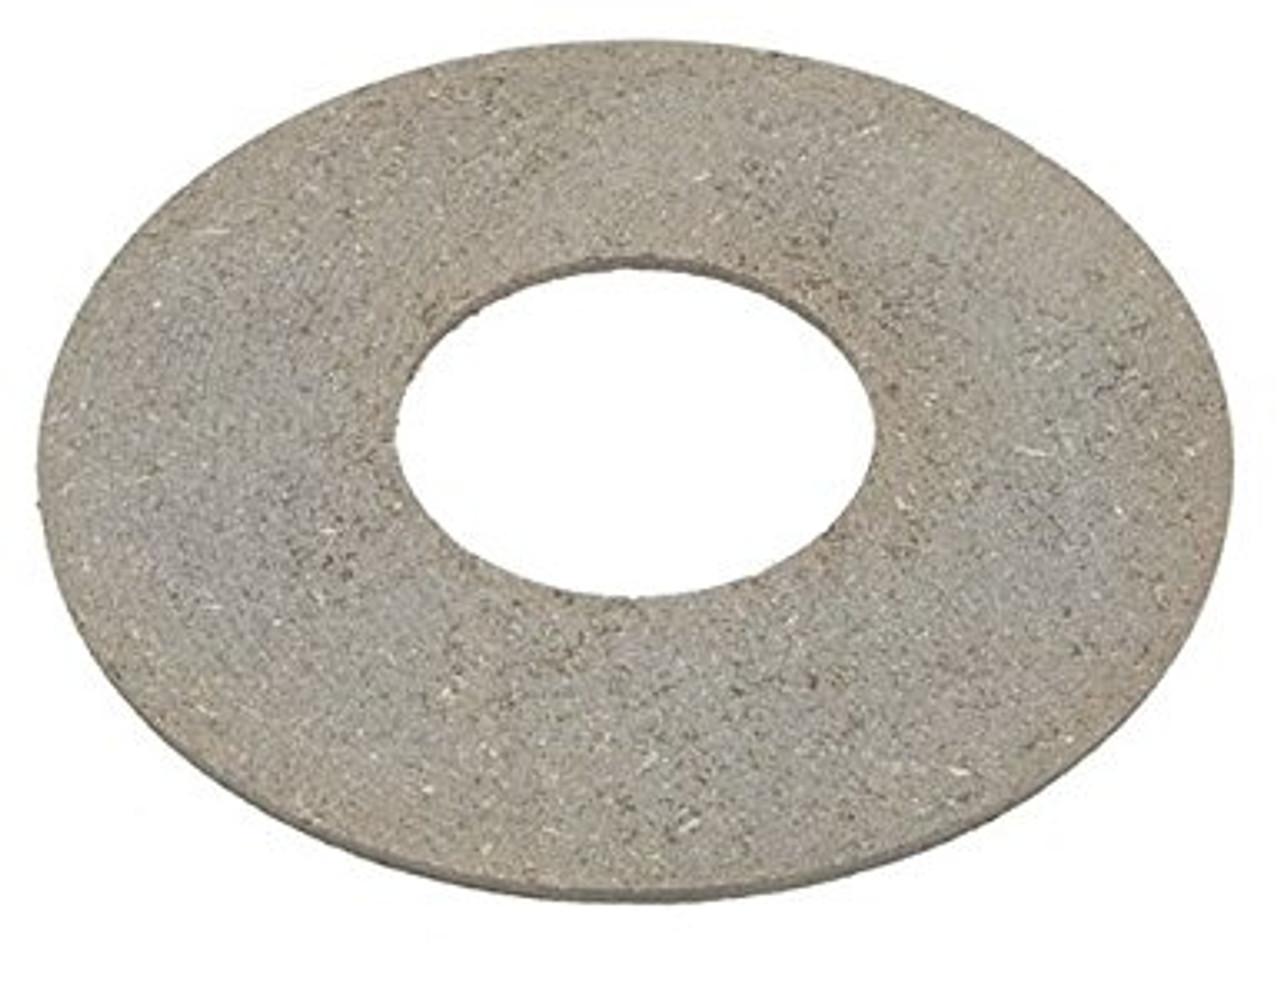 Hardee/Sidewinder Slip Clutch Discs 36F42